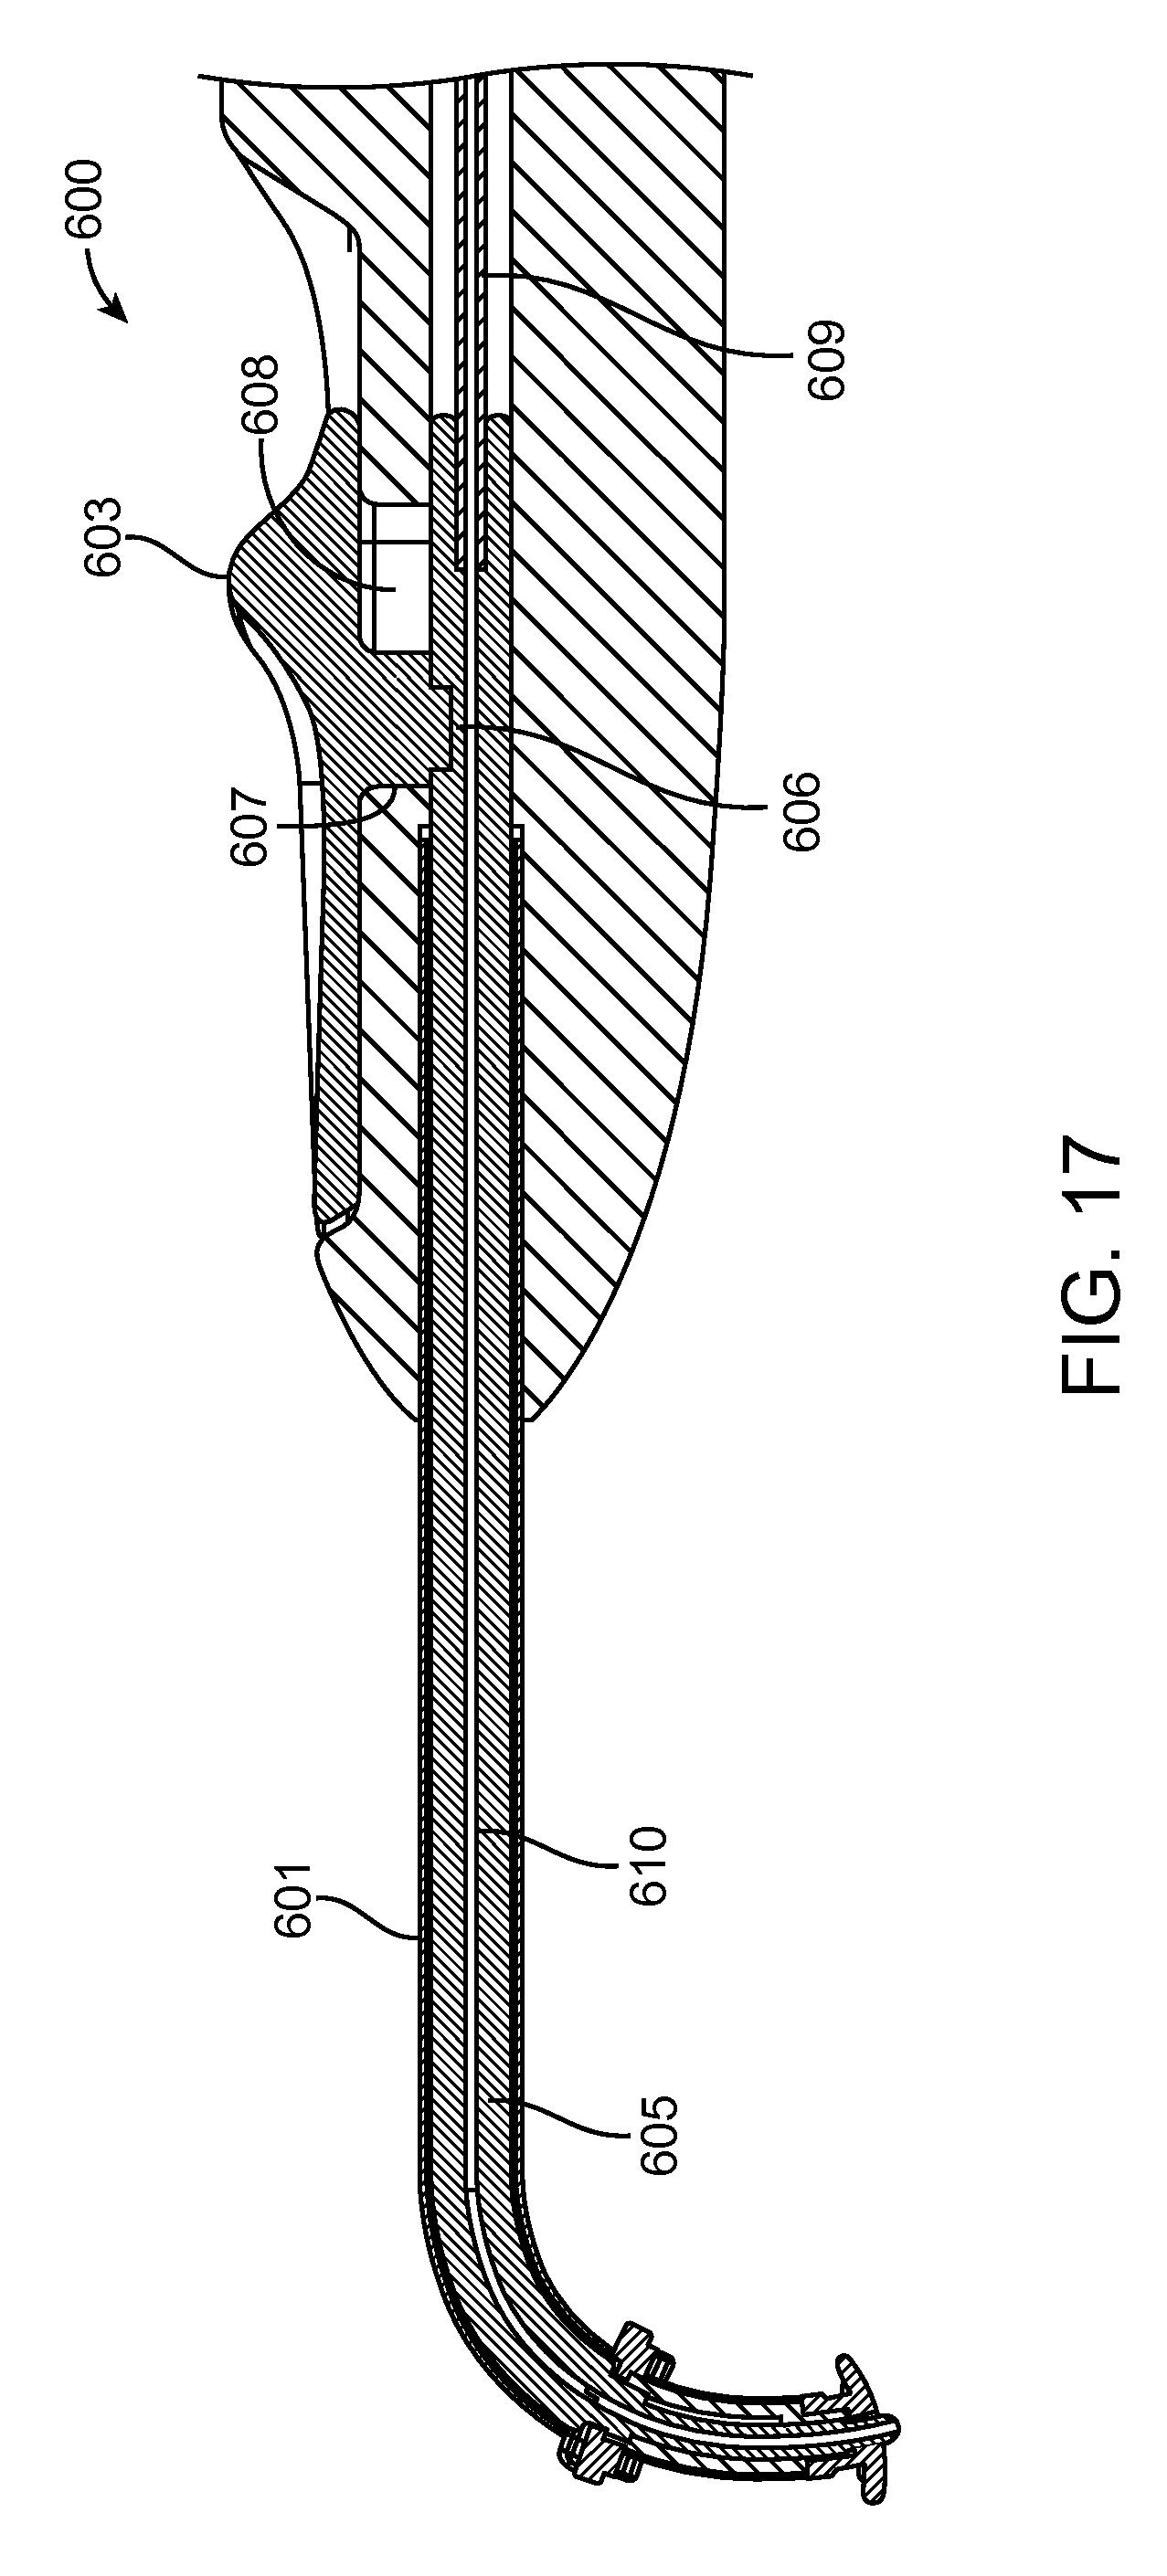 Patent US 9,629,644 B2